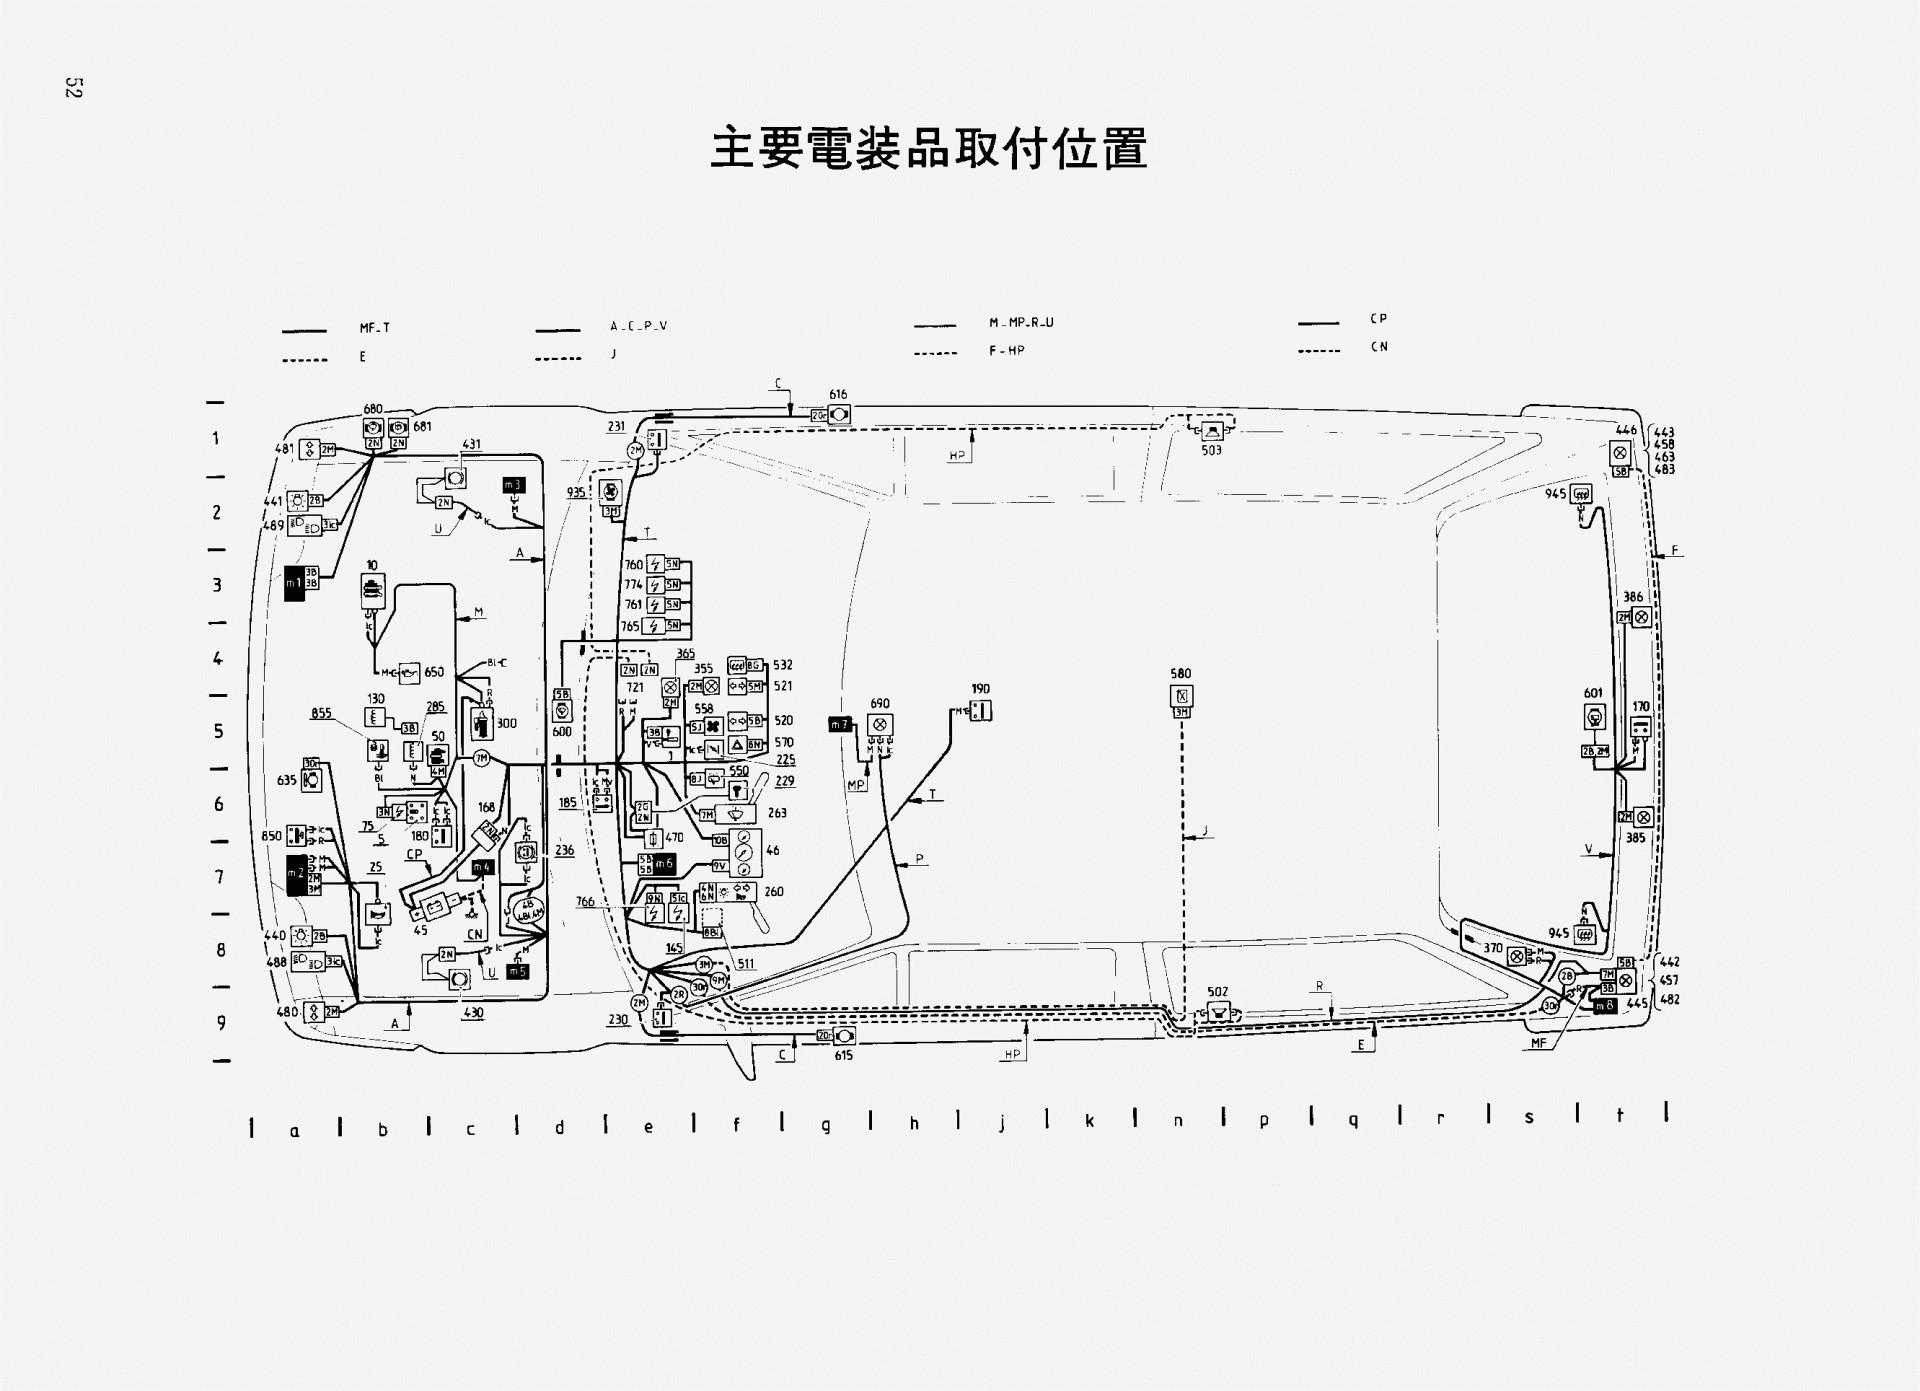 Fahrenheat Electric Baseboard Heater Wiring Diagram